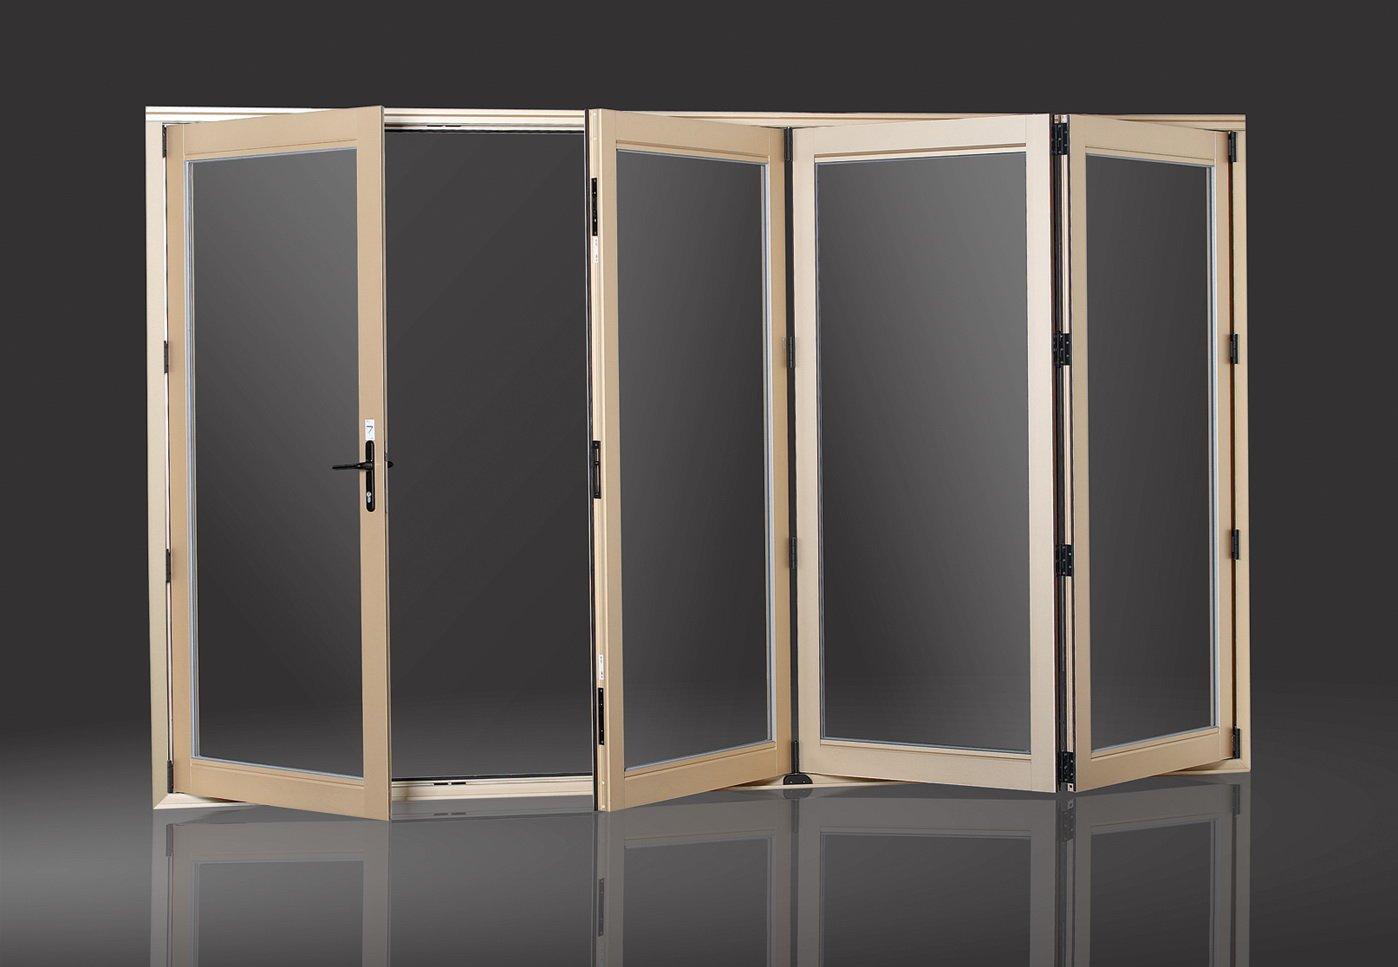 967 #846847  Doors Temper Glass Veranda Bifold Doors Wood Clad Aluminum Glass wallpaper Wood Clad Doors 47551398